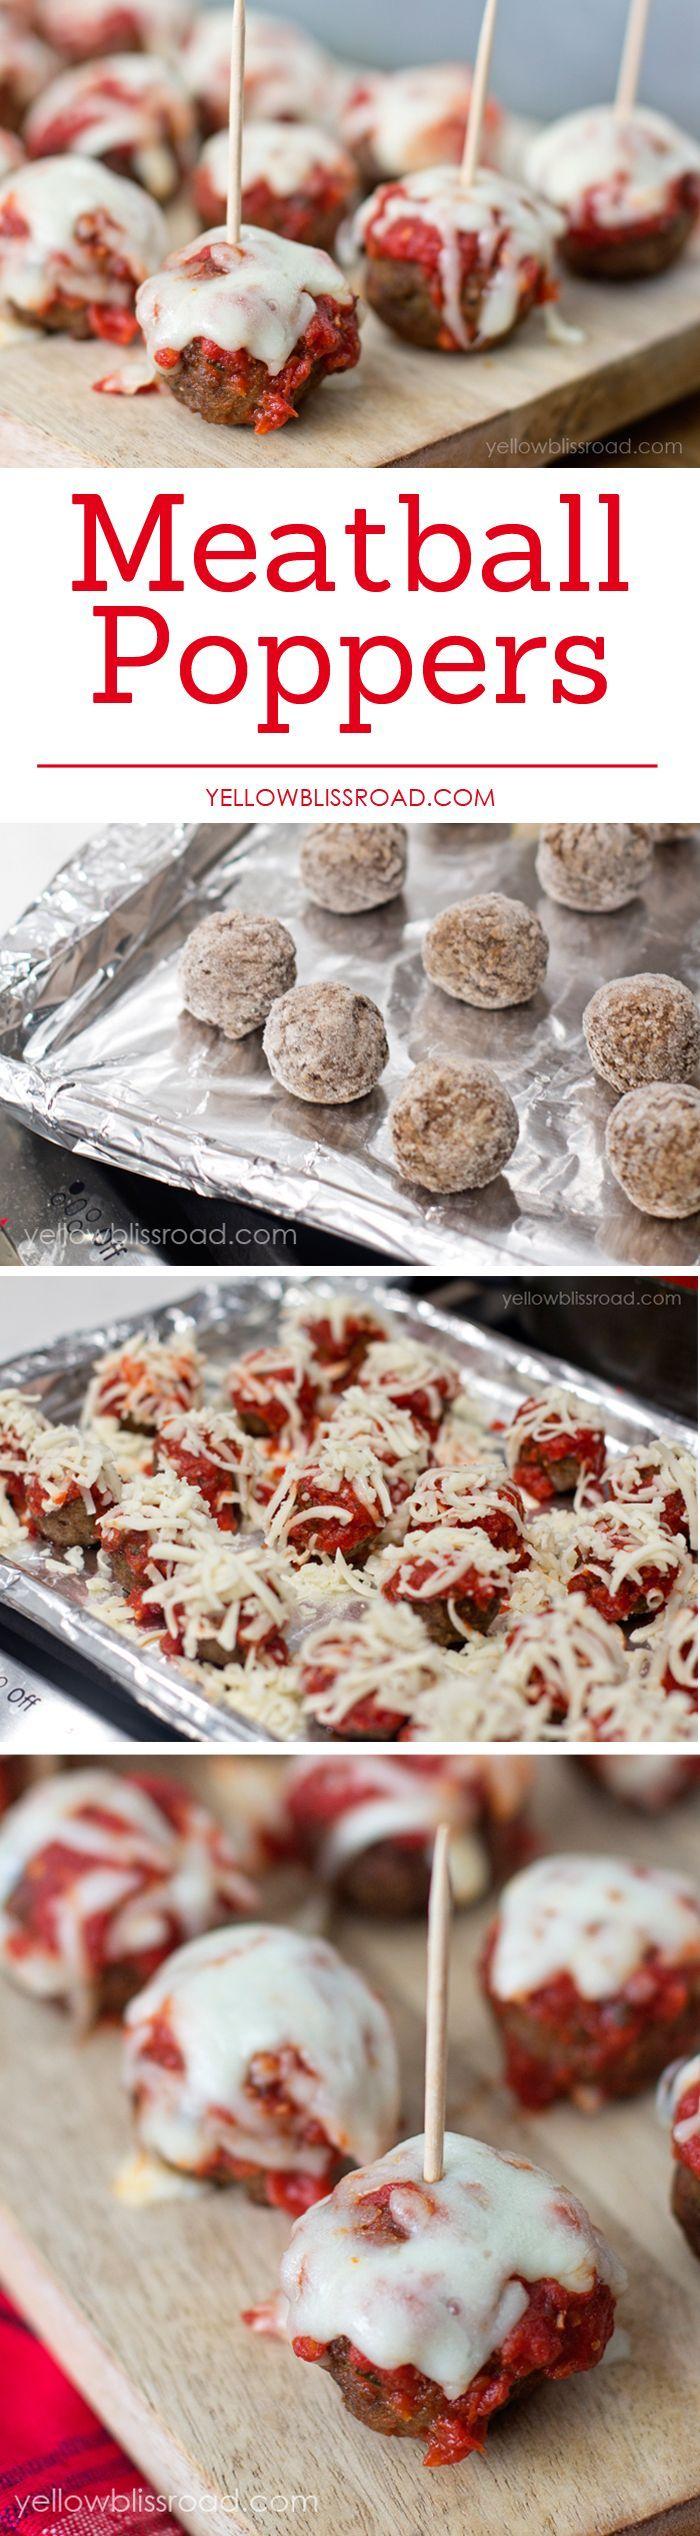 Easy Meatball Poppers with Marinara